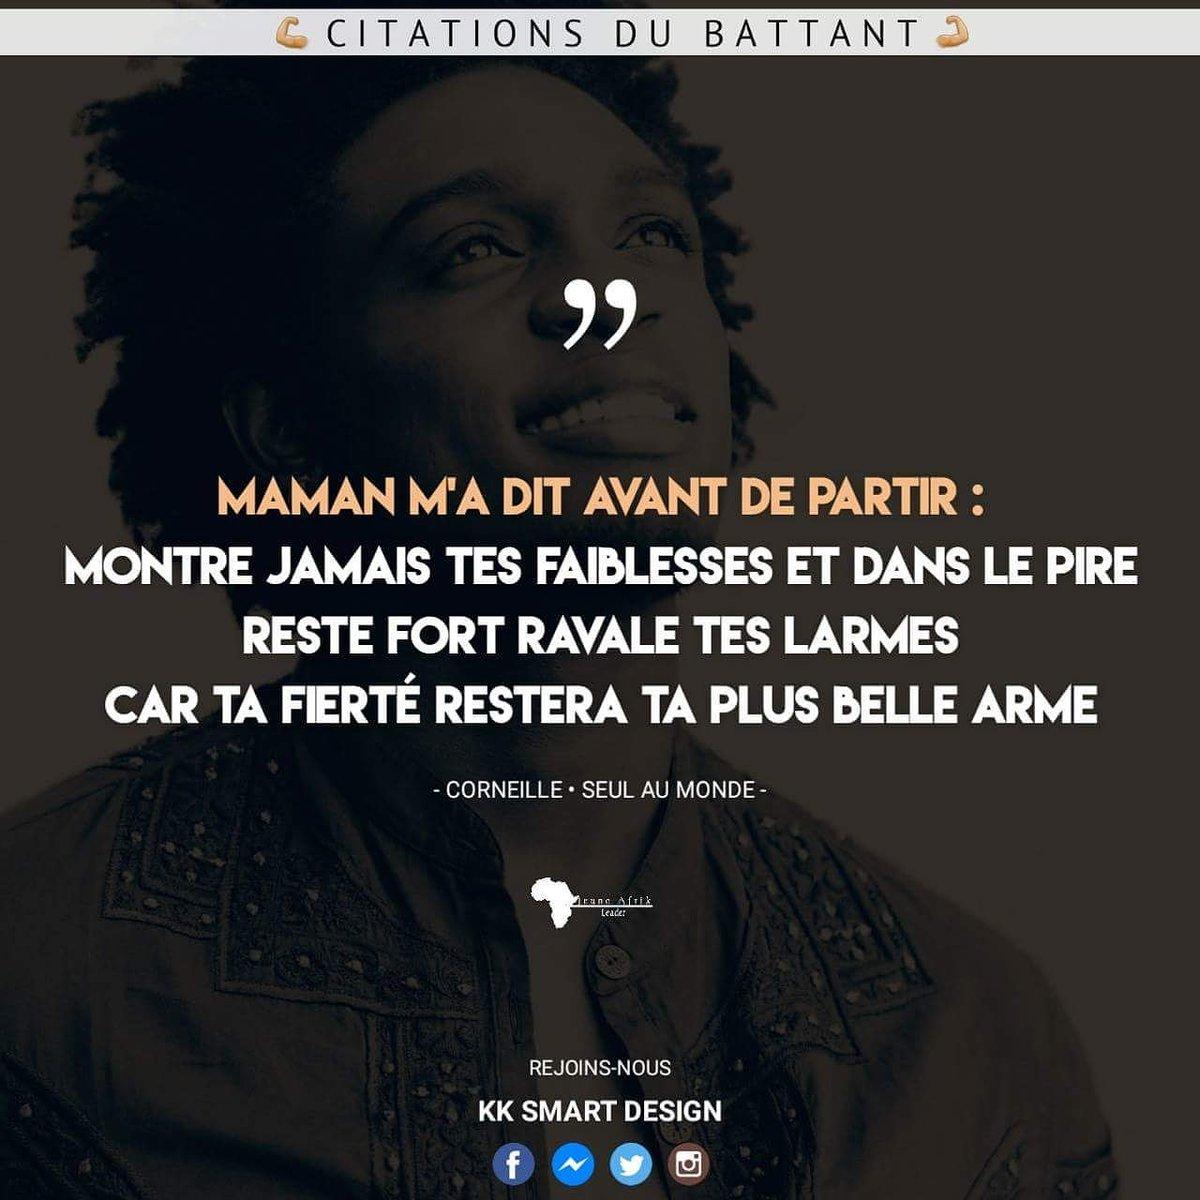 Citations Du Battant On Twitter Stay Strong Cdb2018